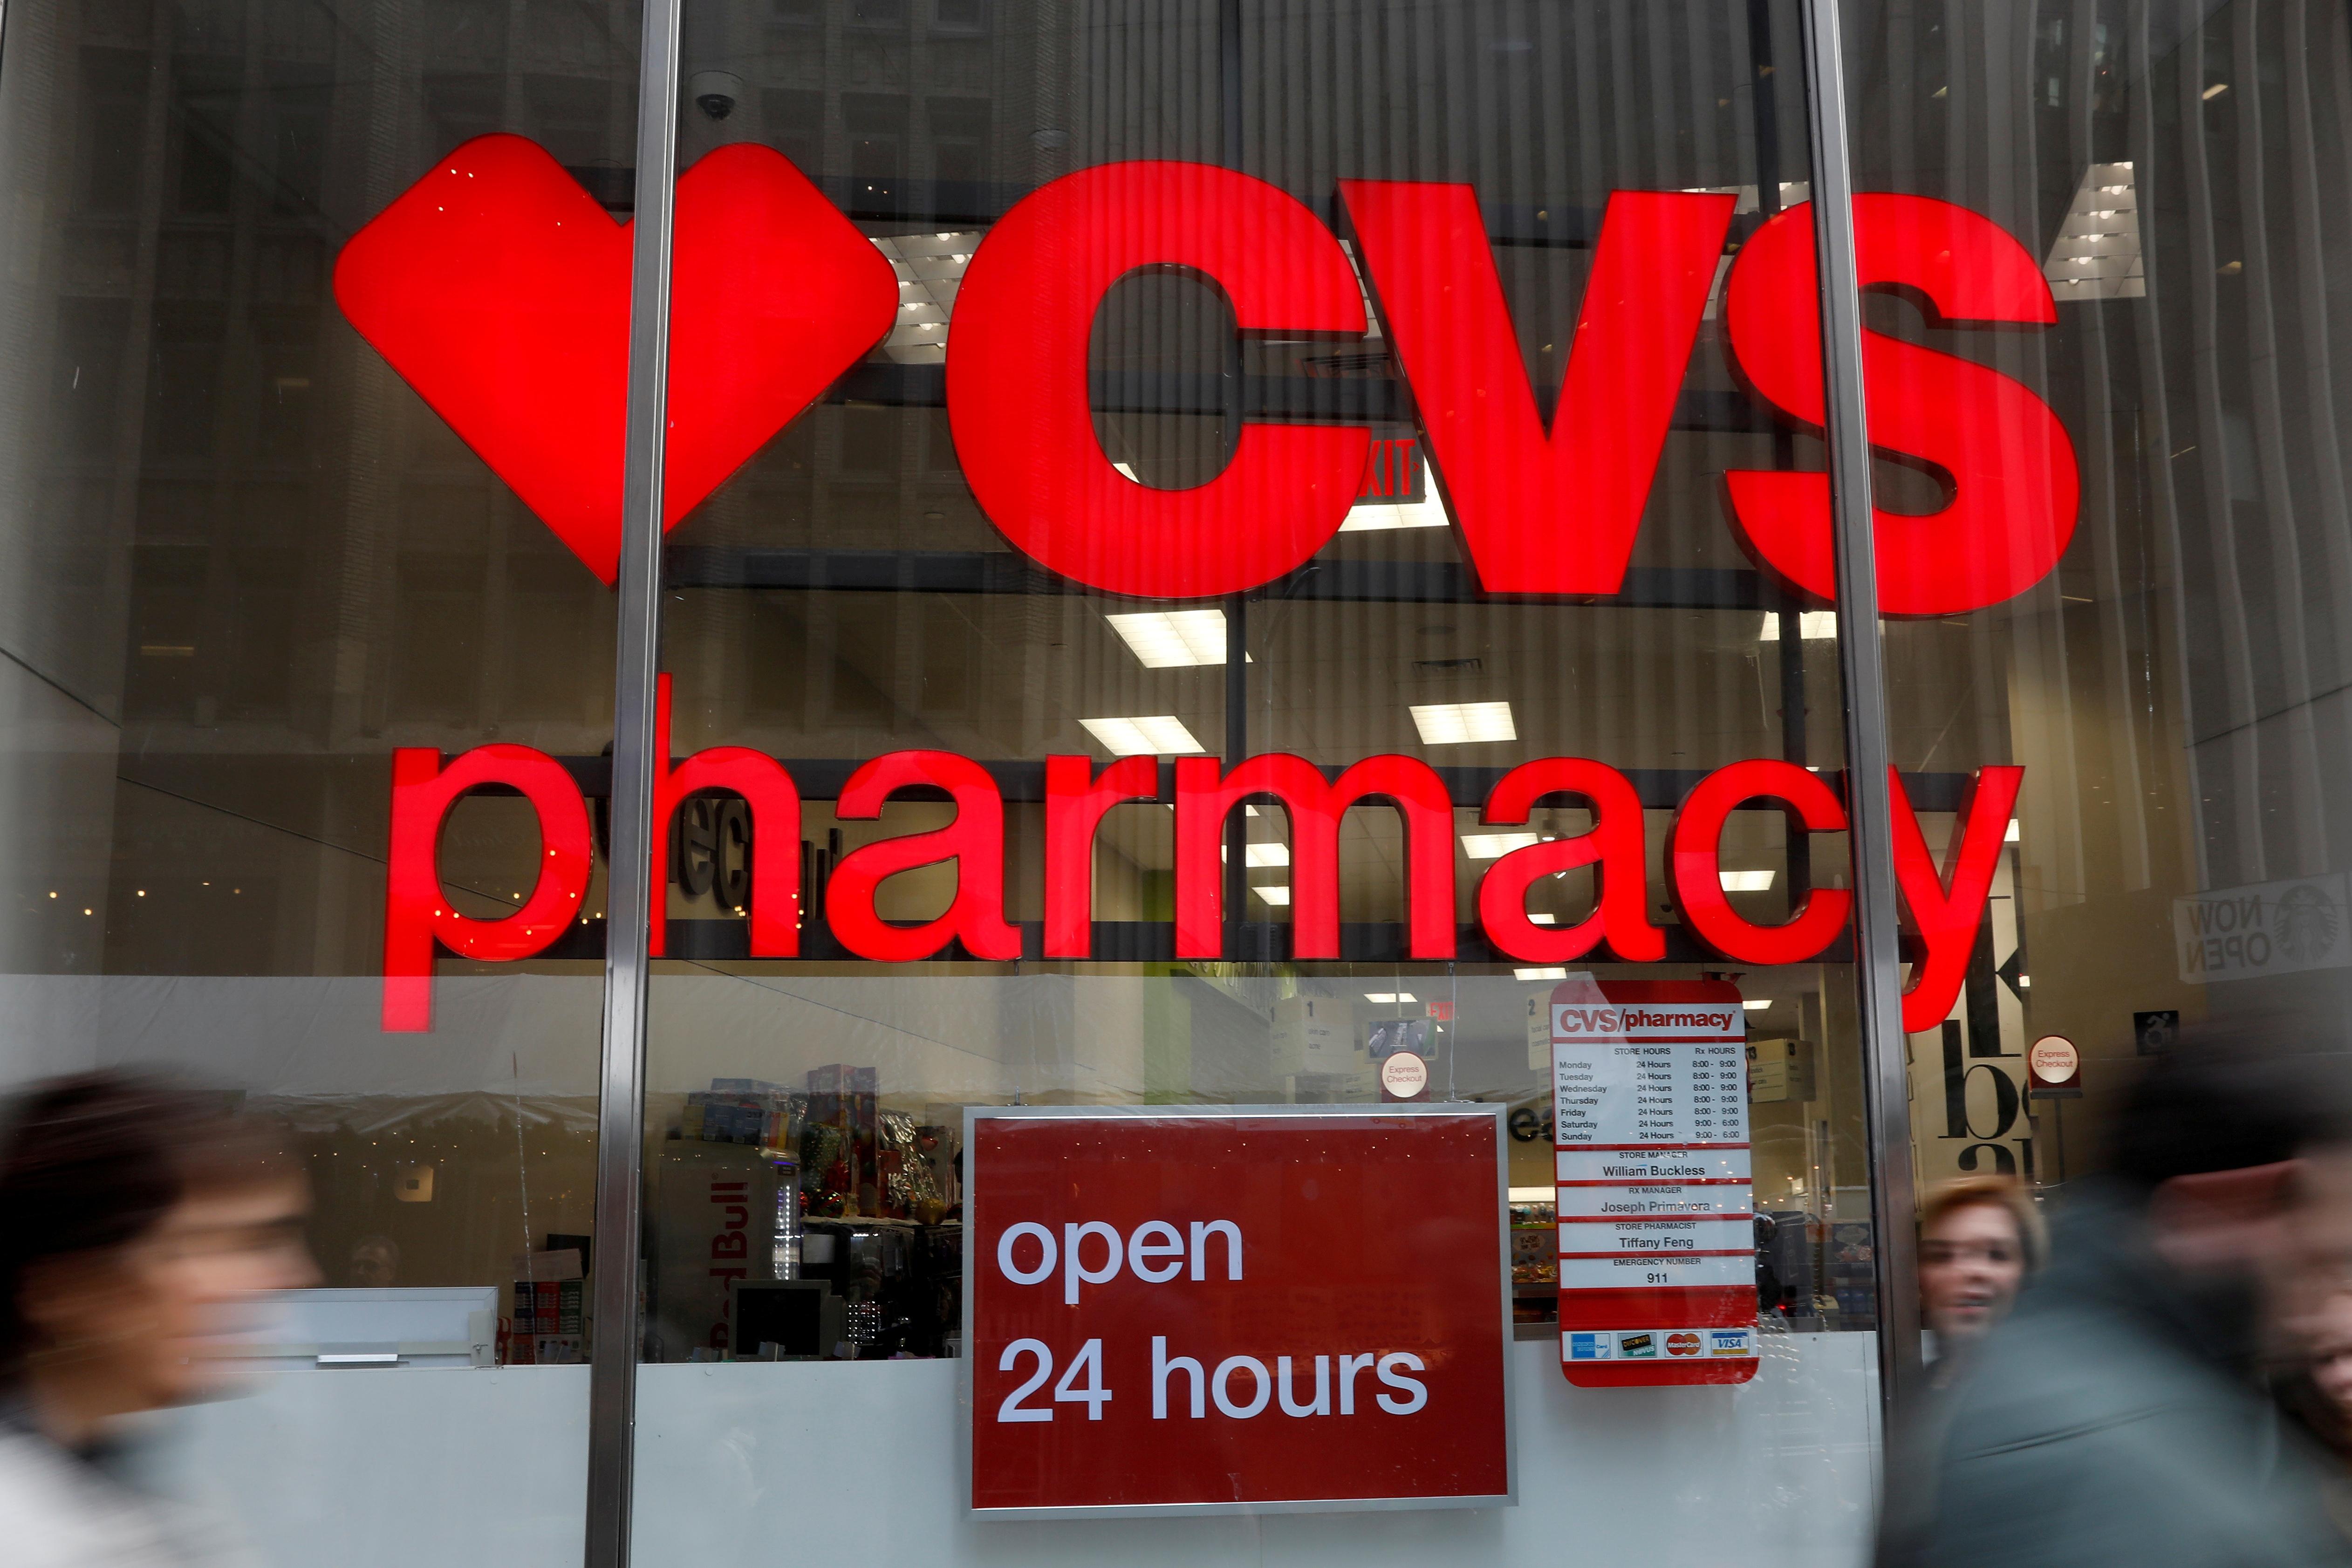 People walk by a CVS Pharmacy store in the Manhattan borough of New York City, New York, U.S., November 30, 2017. REUTERS/Shannon Stapleton/File Photo